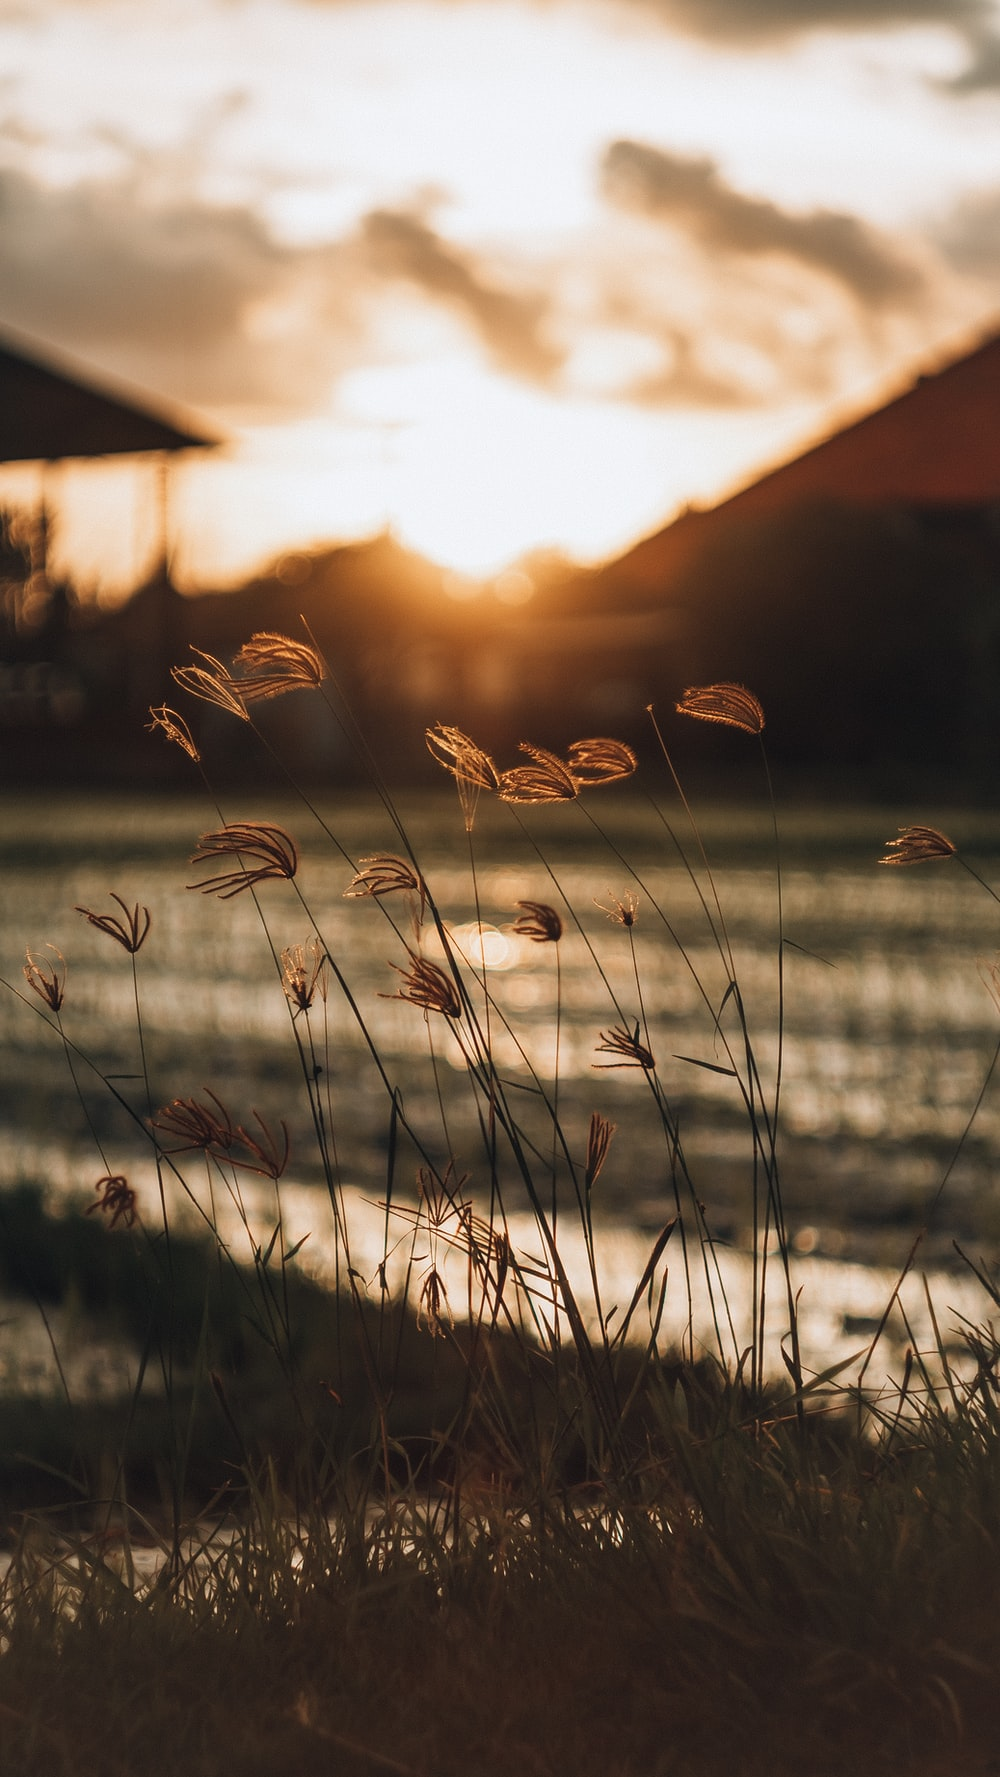 brown grass during golden hour